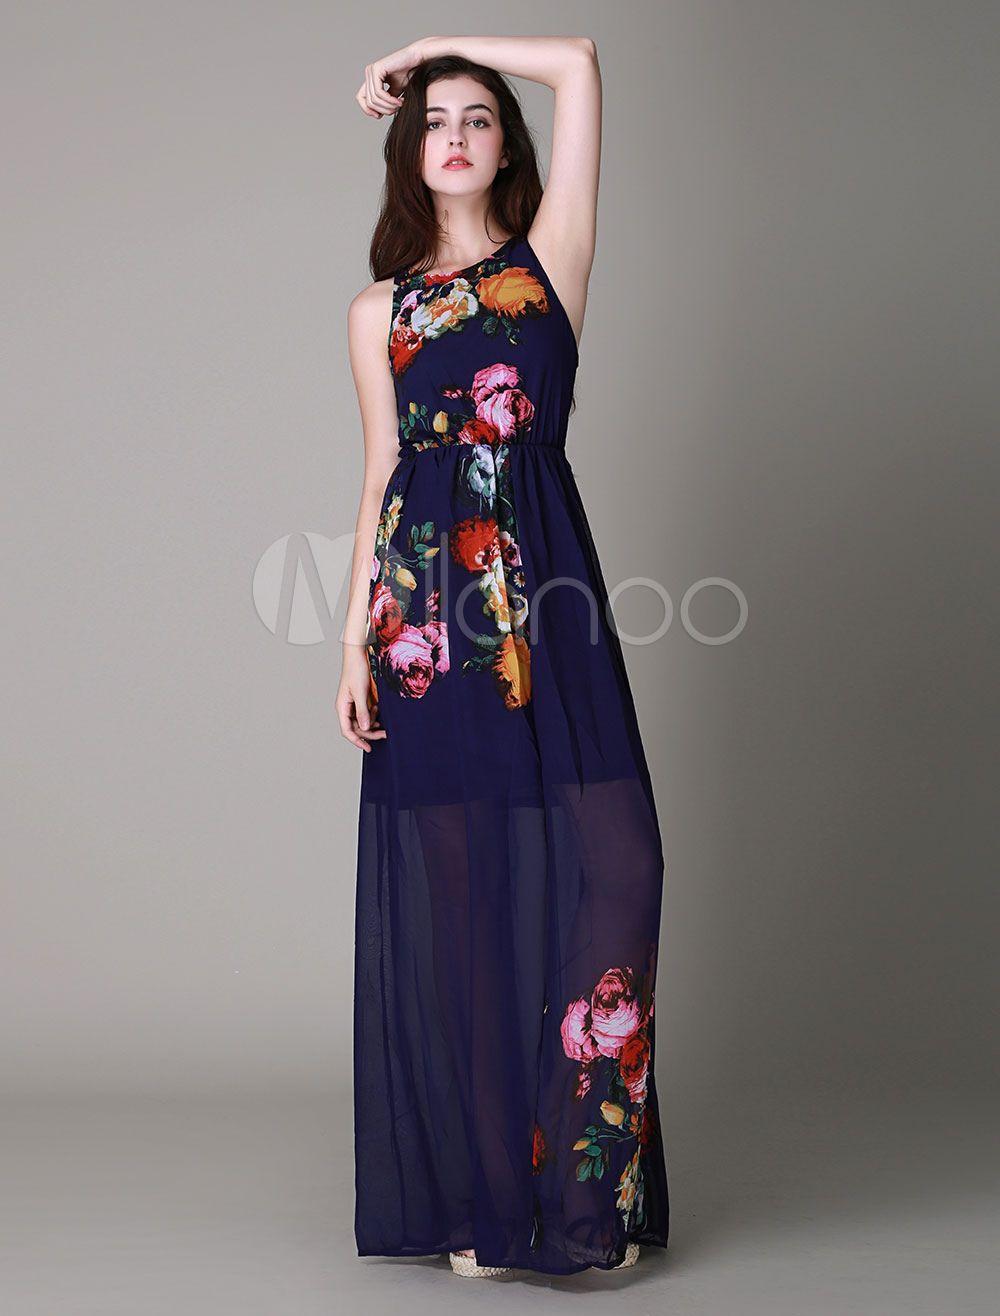 Multicolor Floral Print Chiffon Maxi Dress for Women